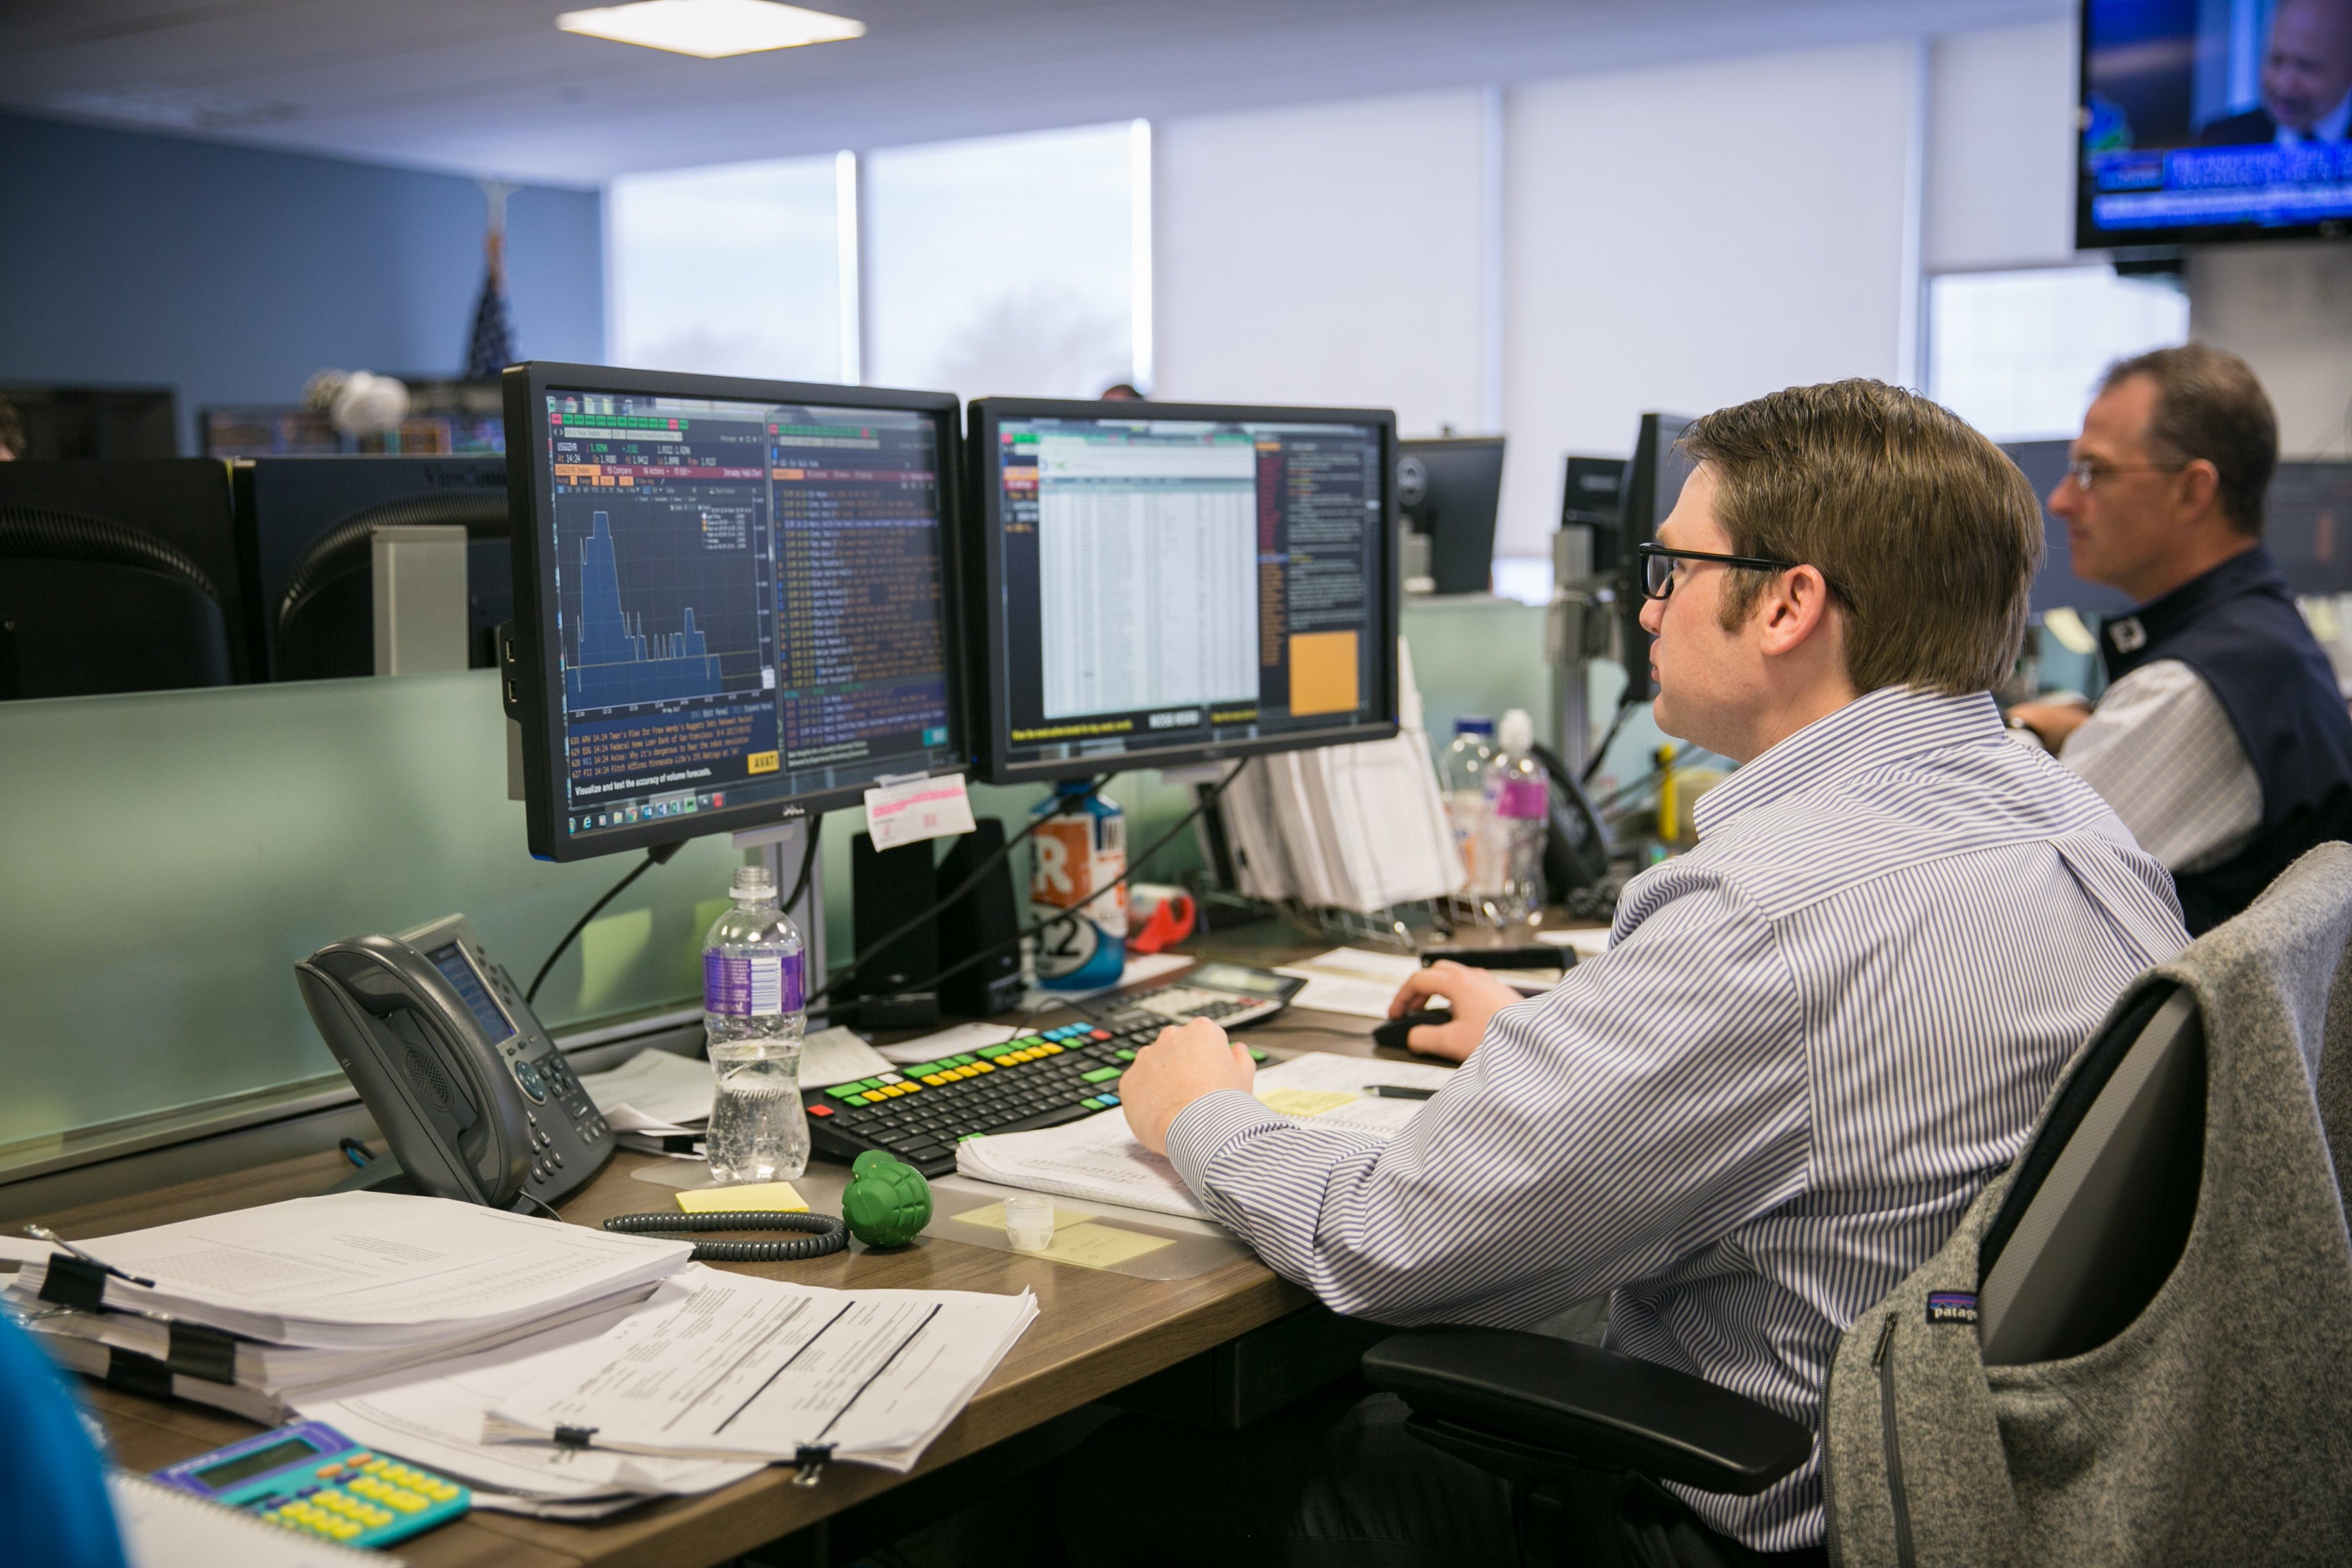 Matthew Murawski working at Drexel Hamilton office in the Financial District of Manhattan on May 9, 2017. (Benjamin Chasteen/Epoch Times)